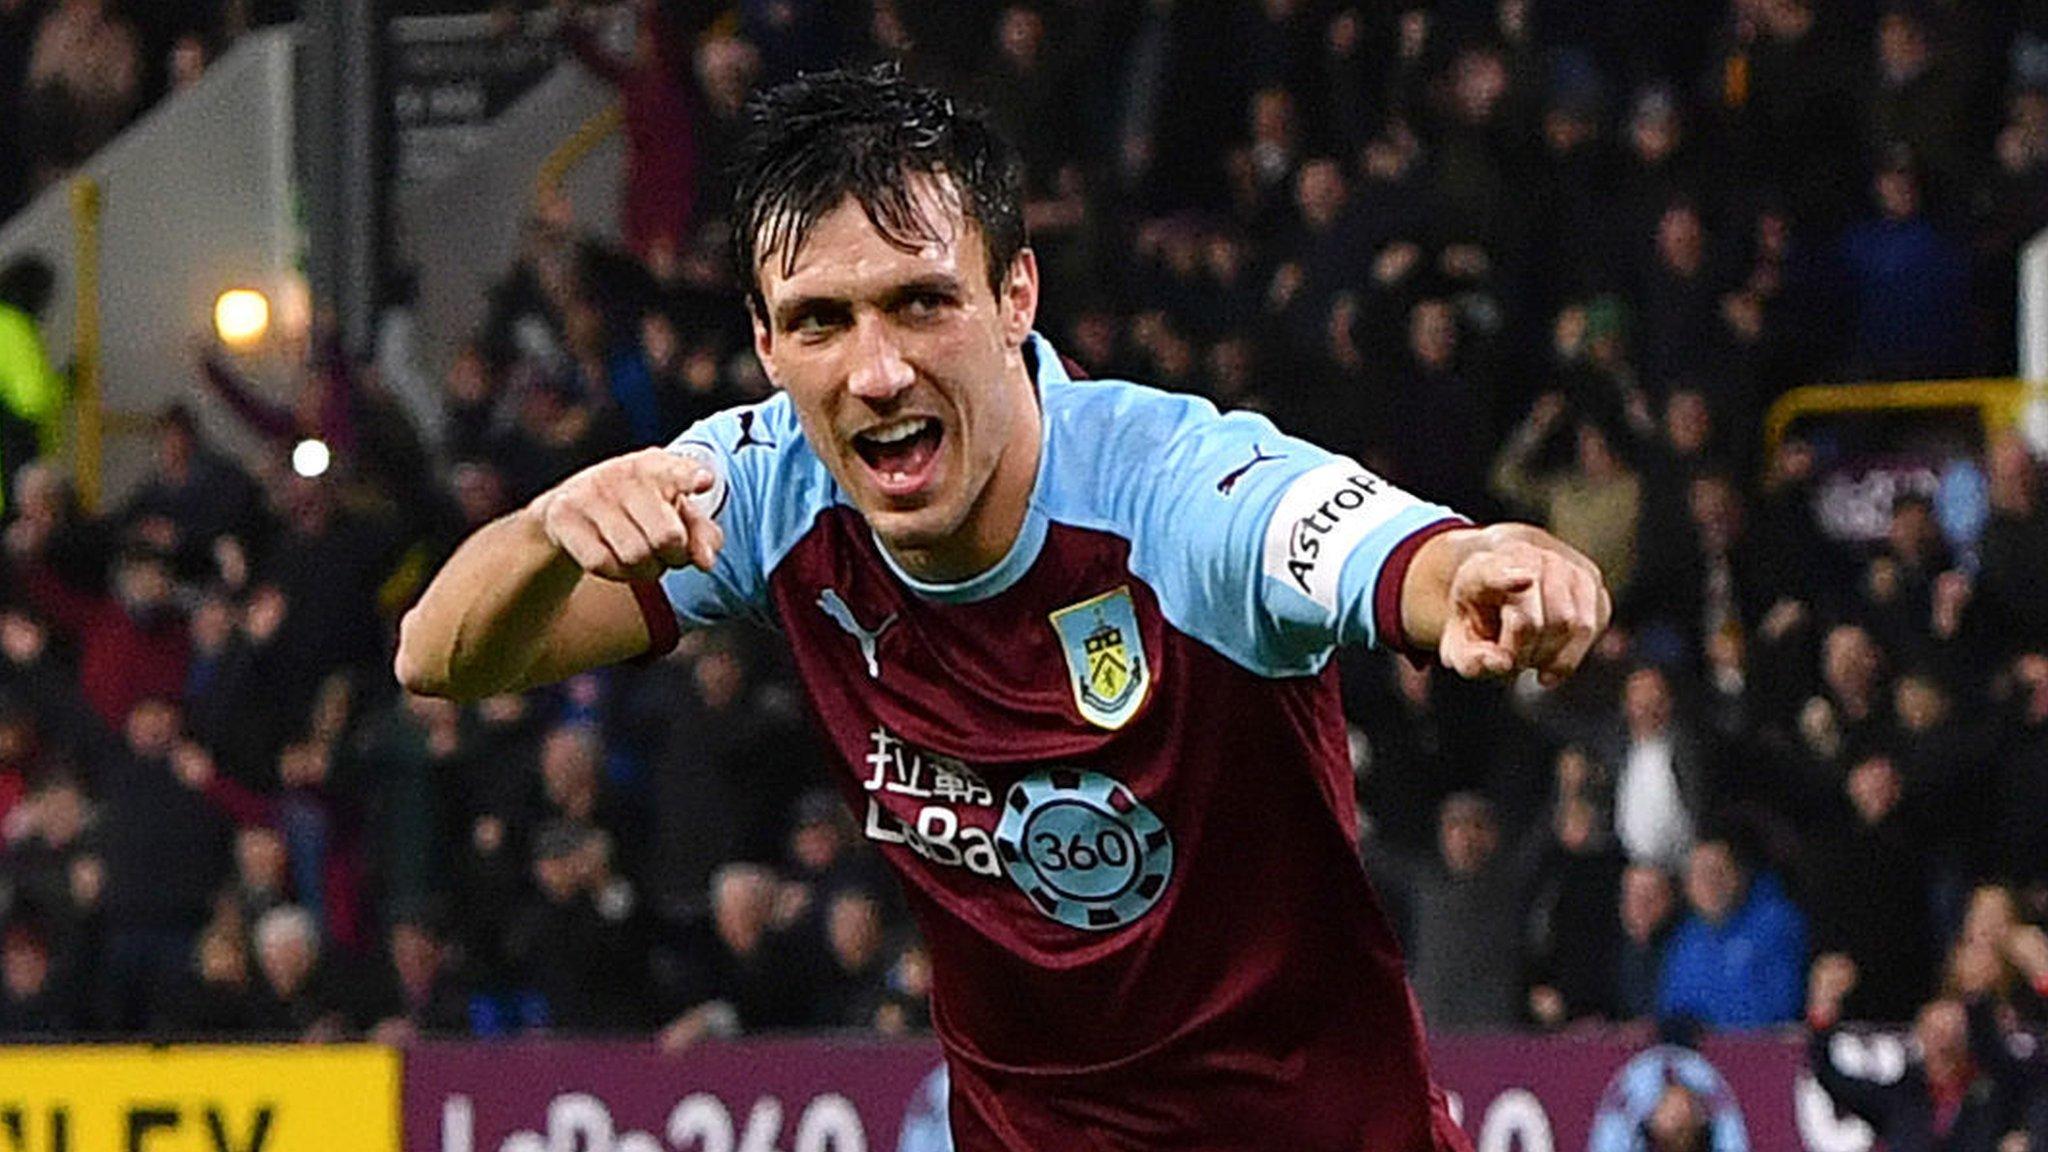 Burnley 1-0 Brighton: James Tarkowksi goal earns Clarets hard-fought win